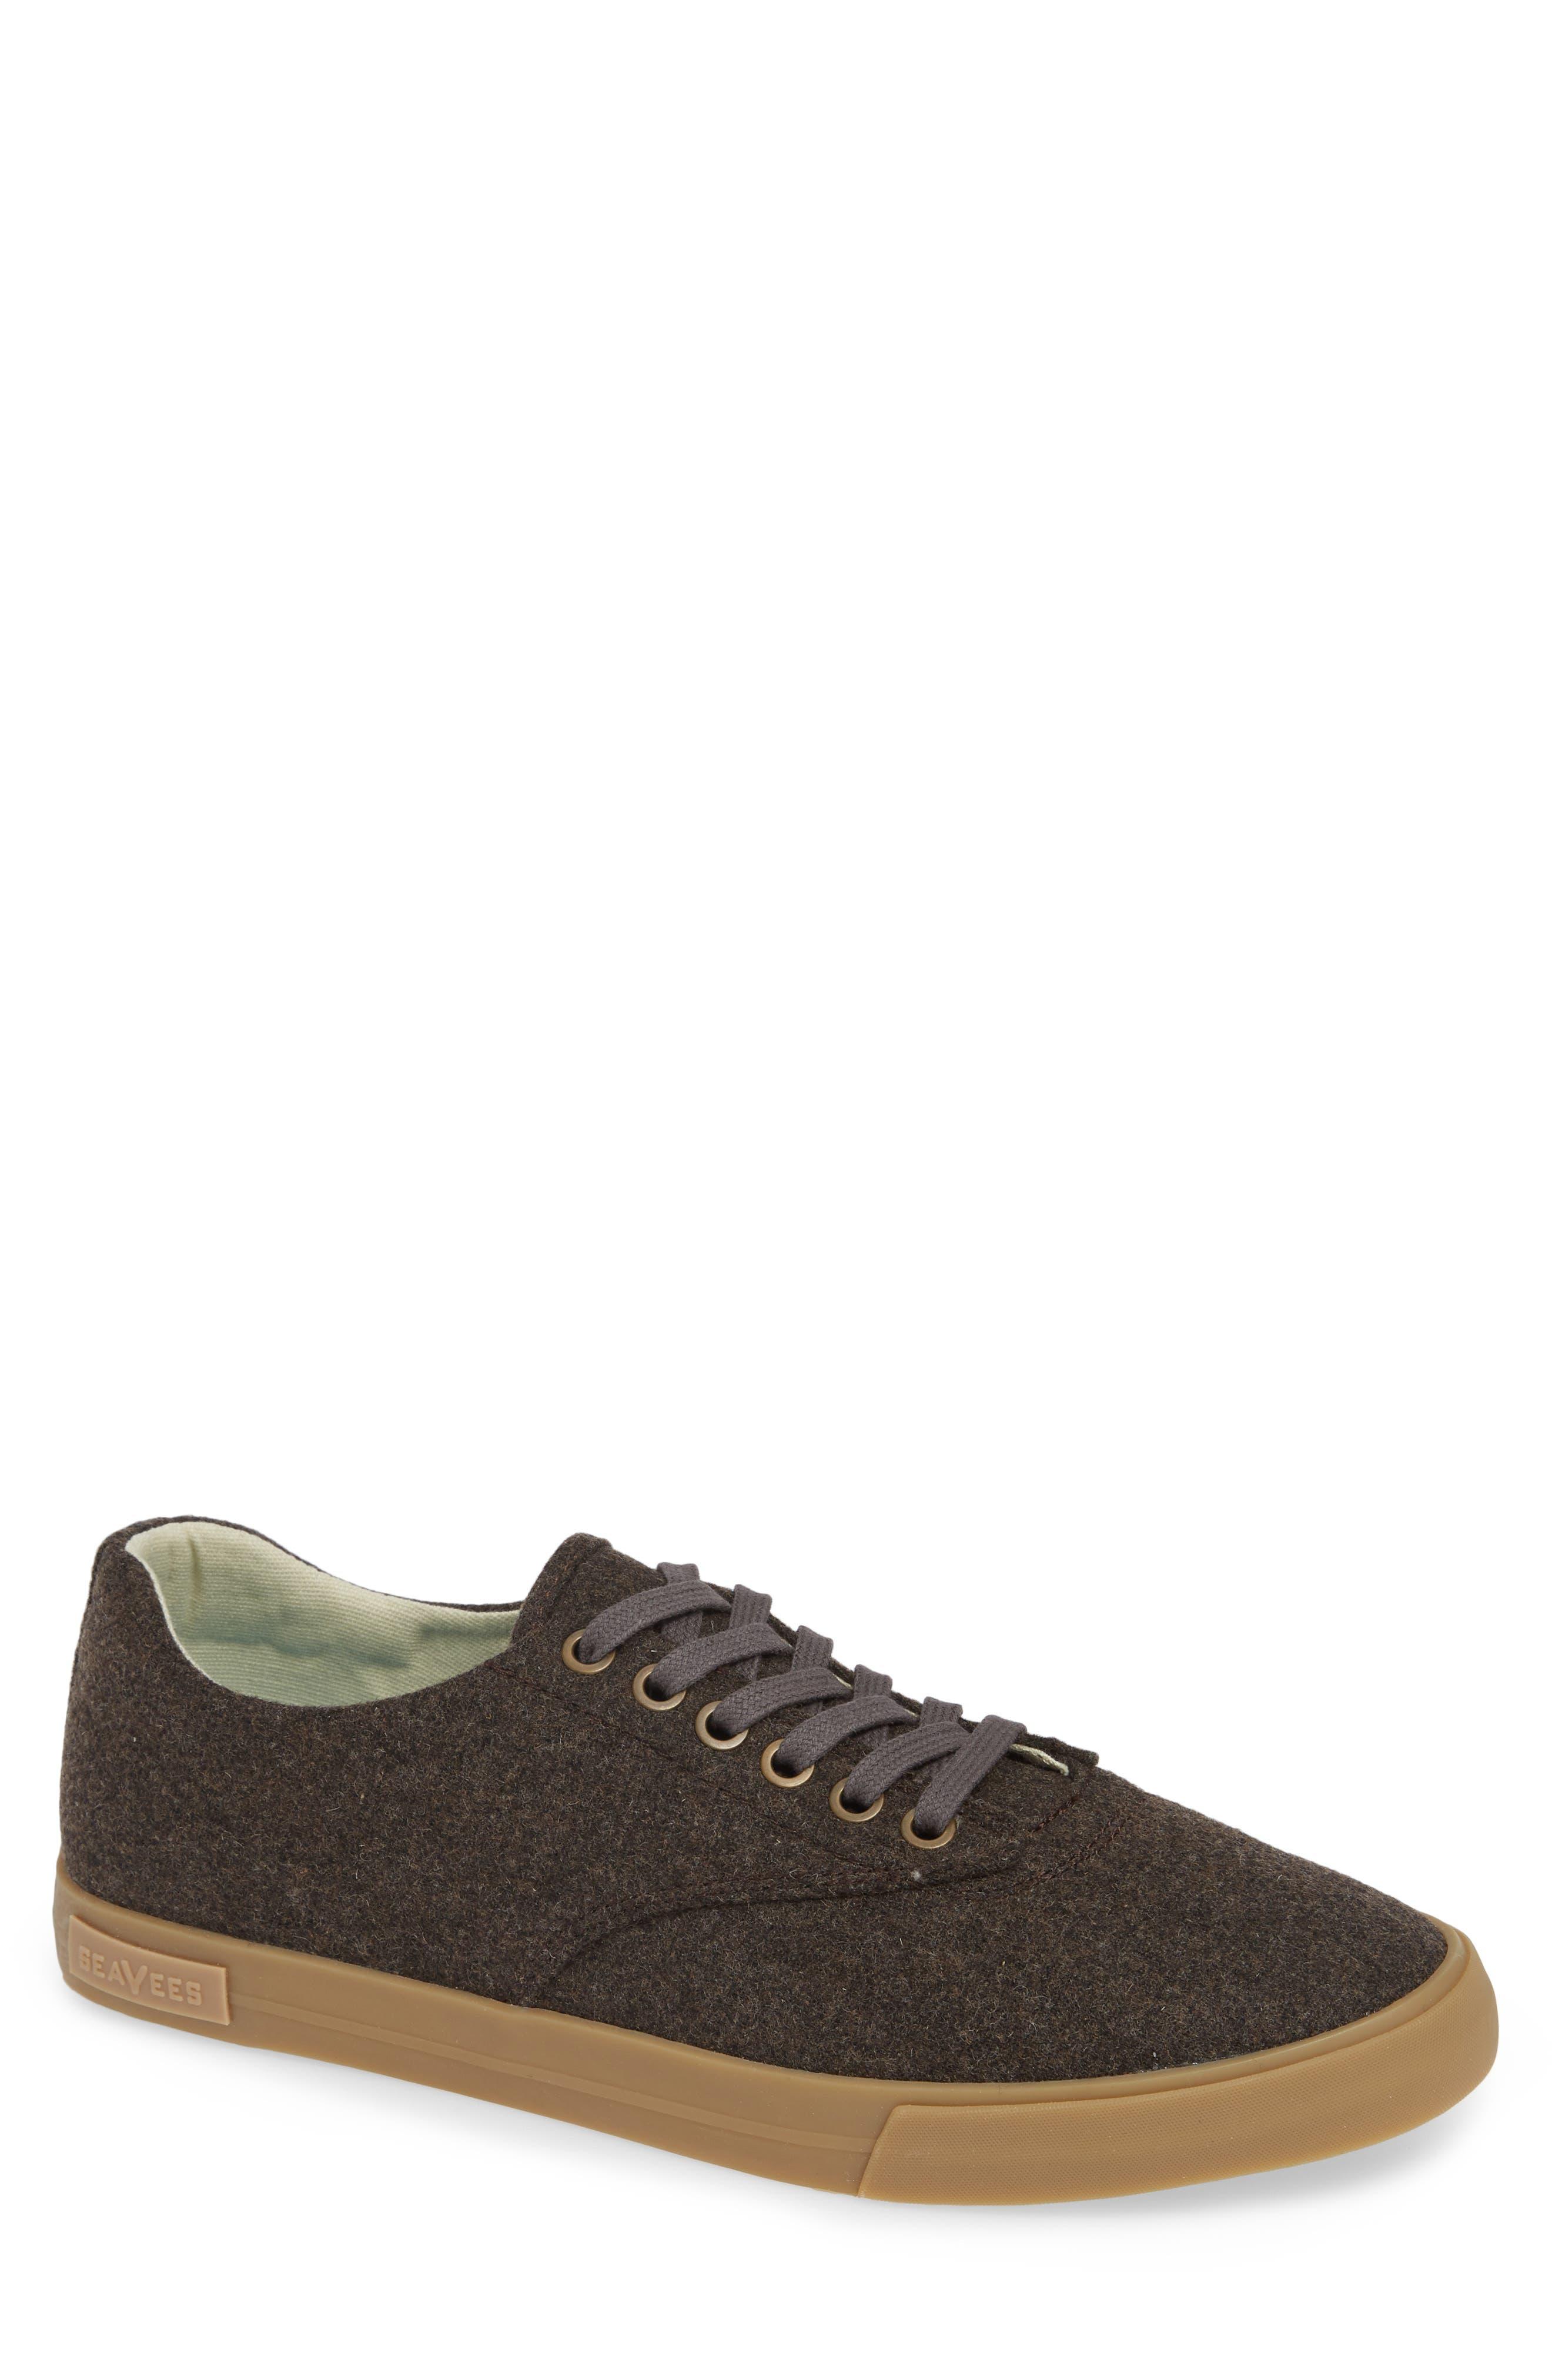 Hermosa Grayers Sneaker,                         Main,                         color, DARK BROWN WOOL FLANNEL